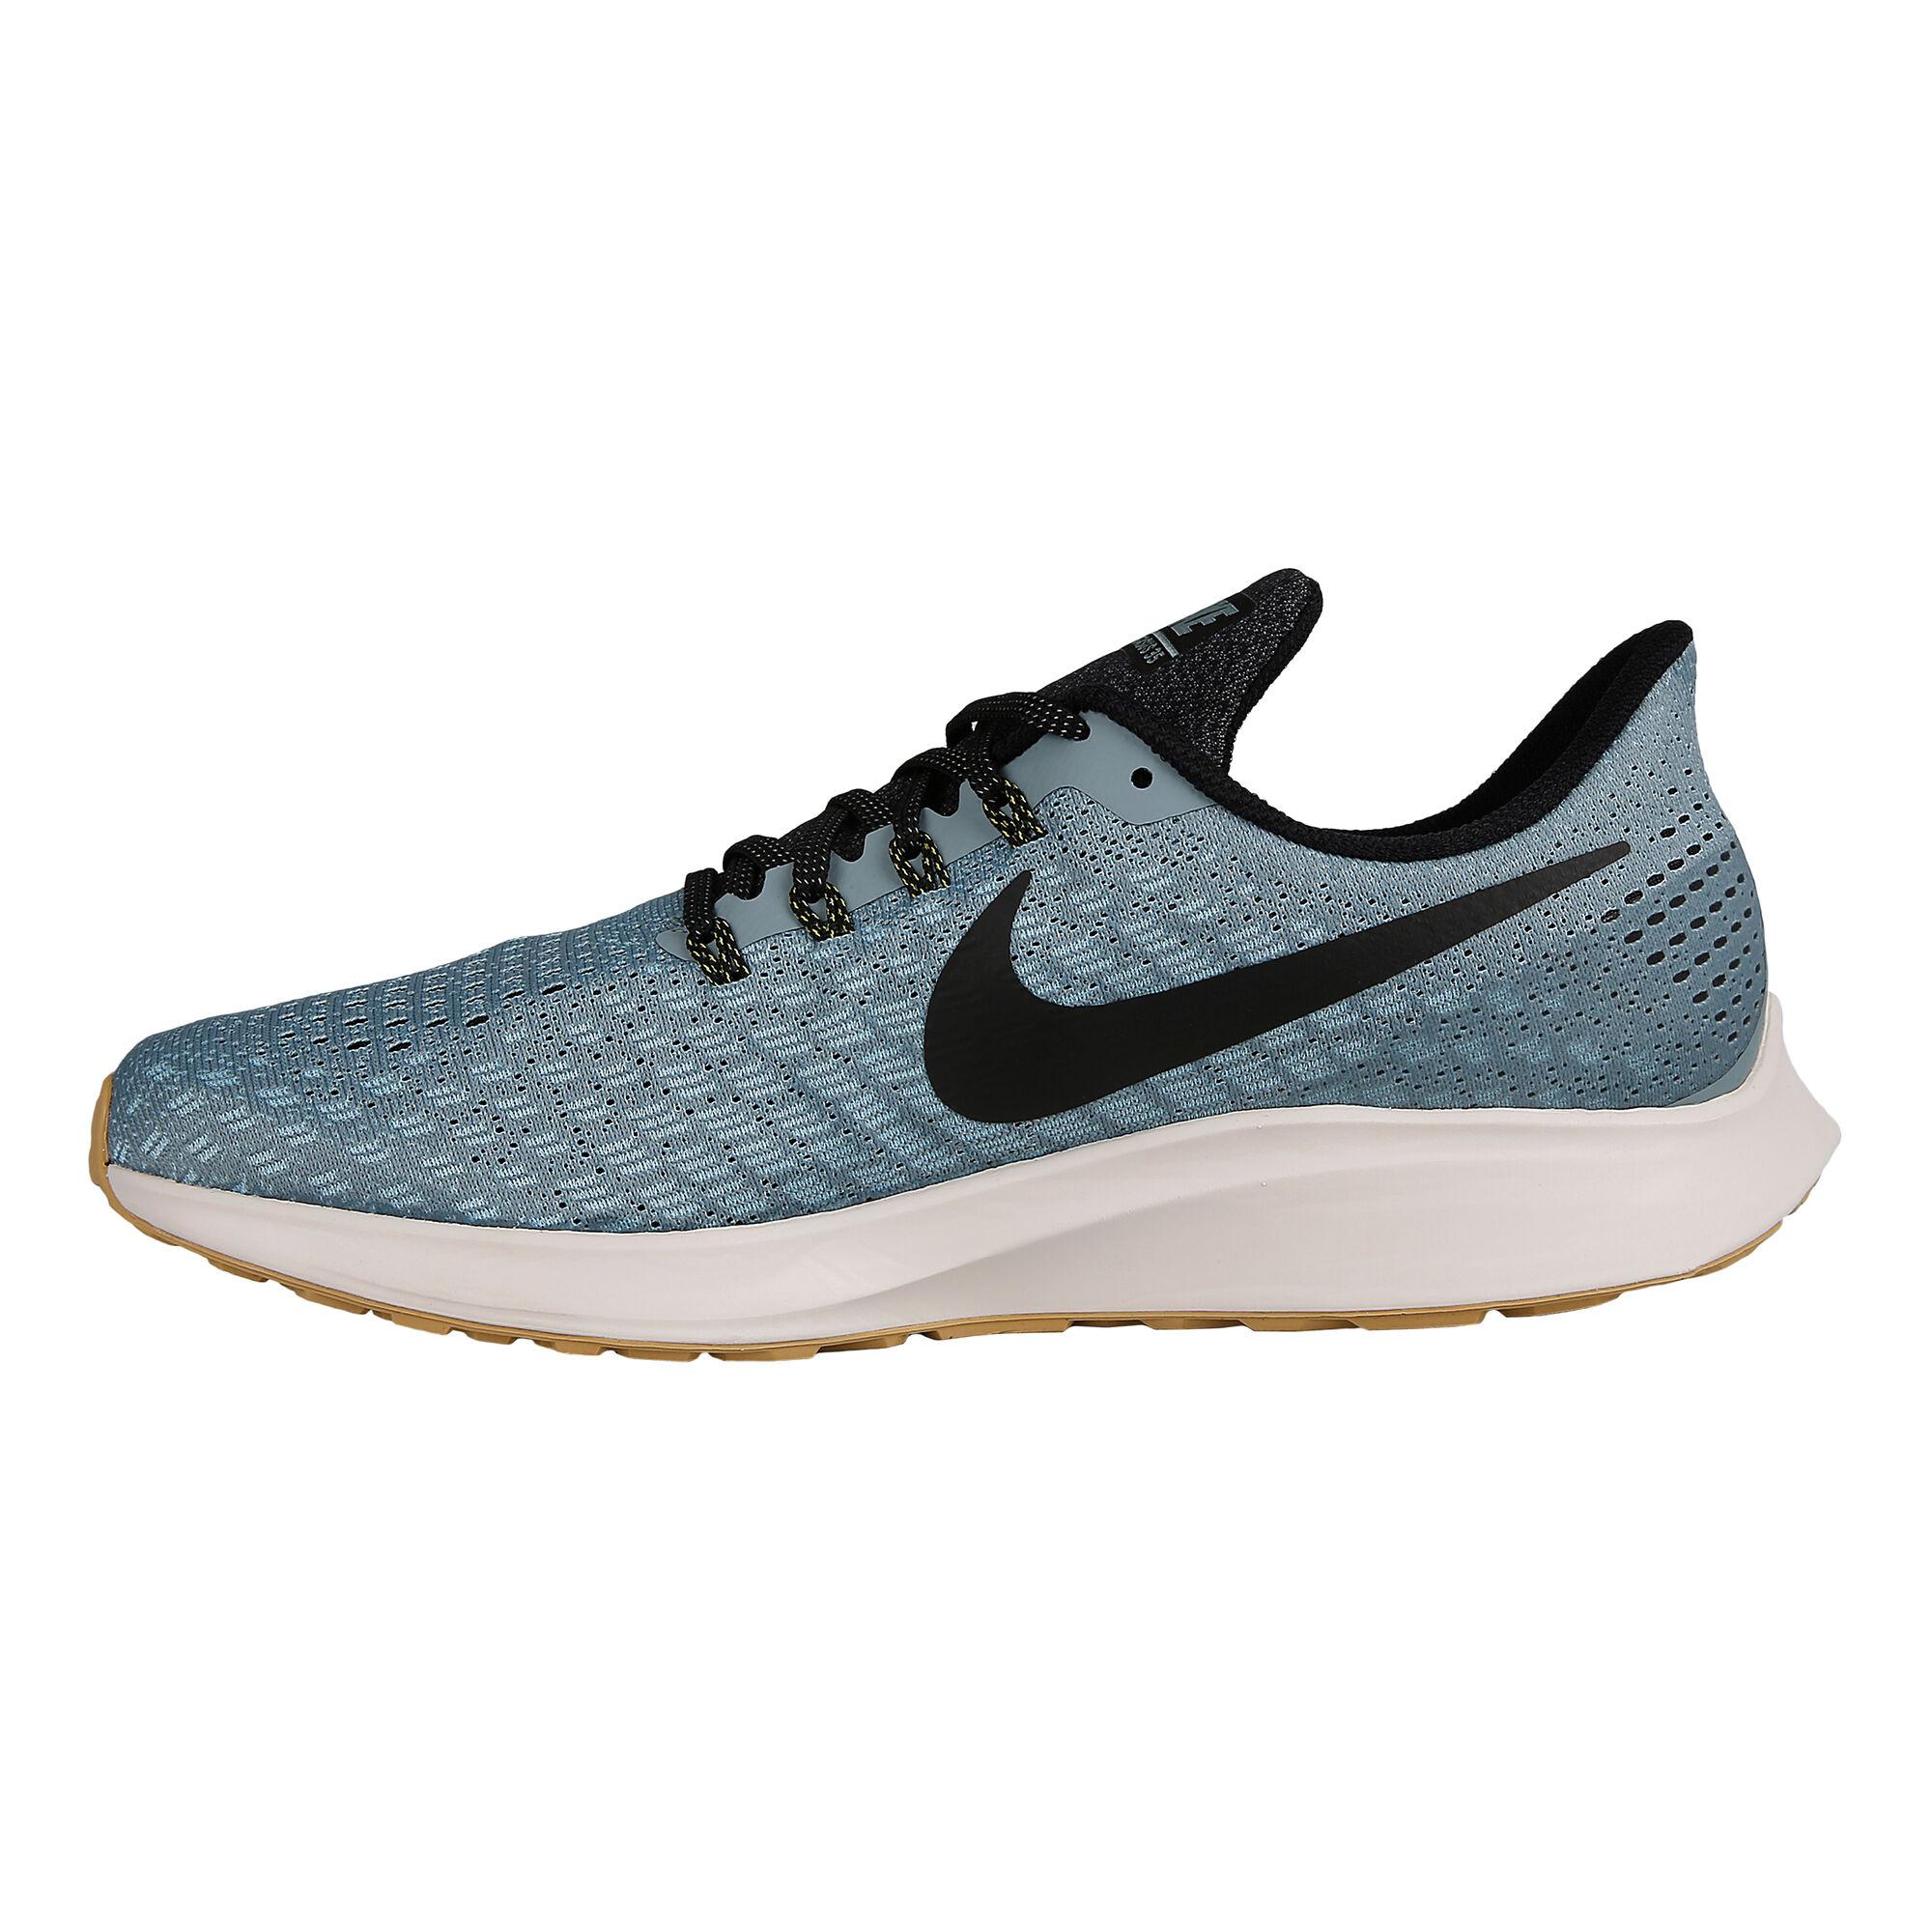 reputable site 9bd1c ae572 Nike  Nike  Nike  Nike  Nike  Nike  Nike  Nike  Nike. Air Zoom Pegasus 35  ...